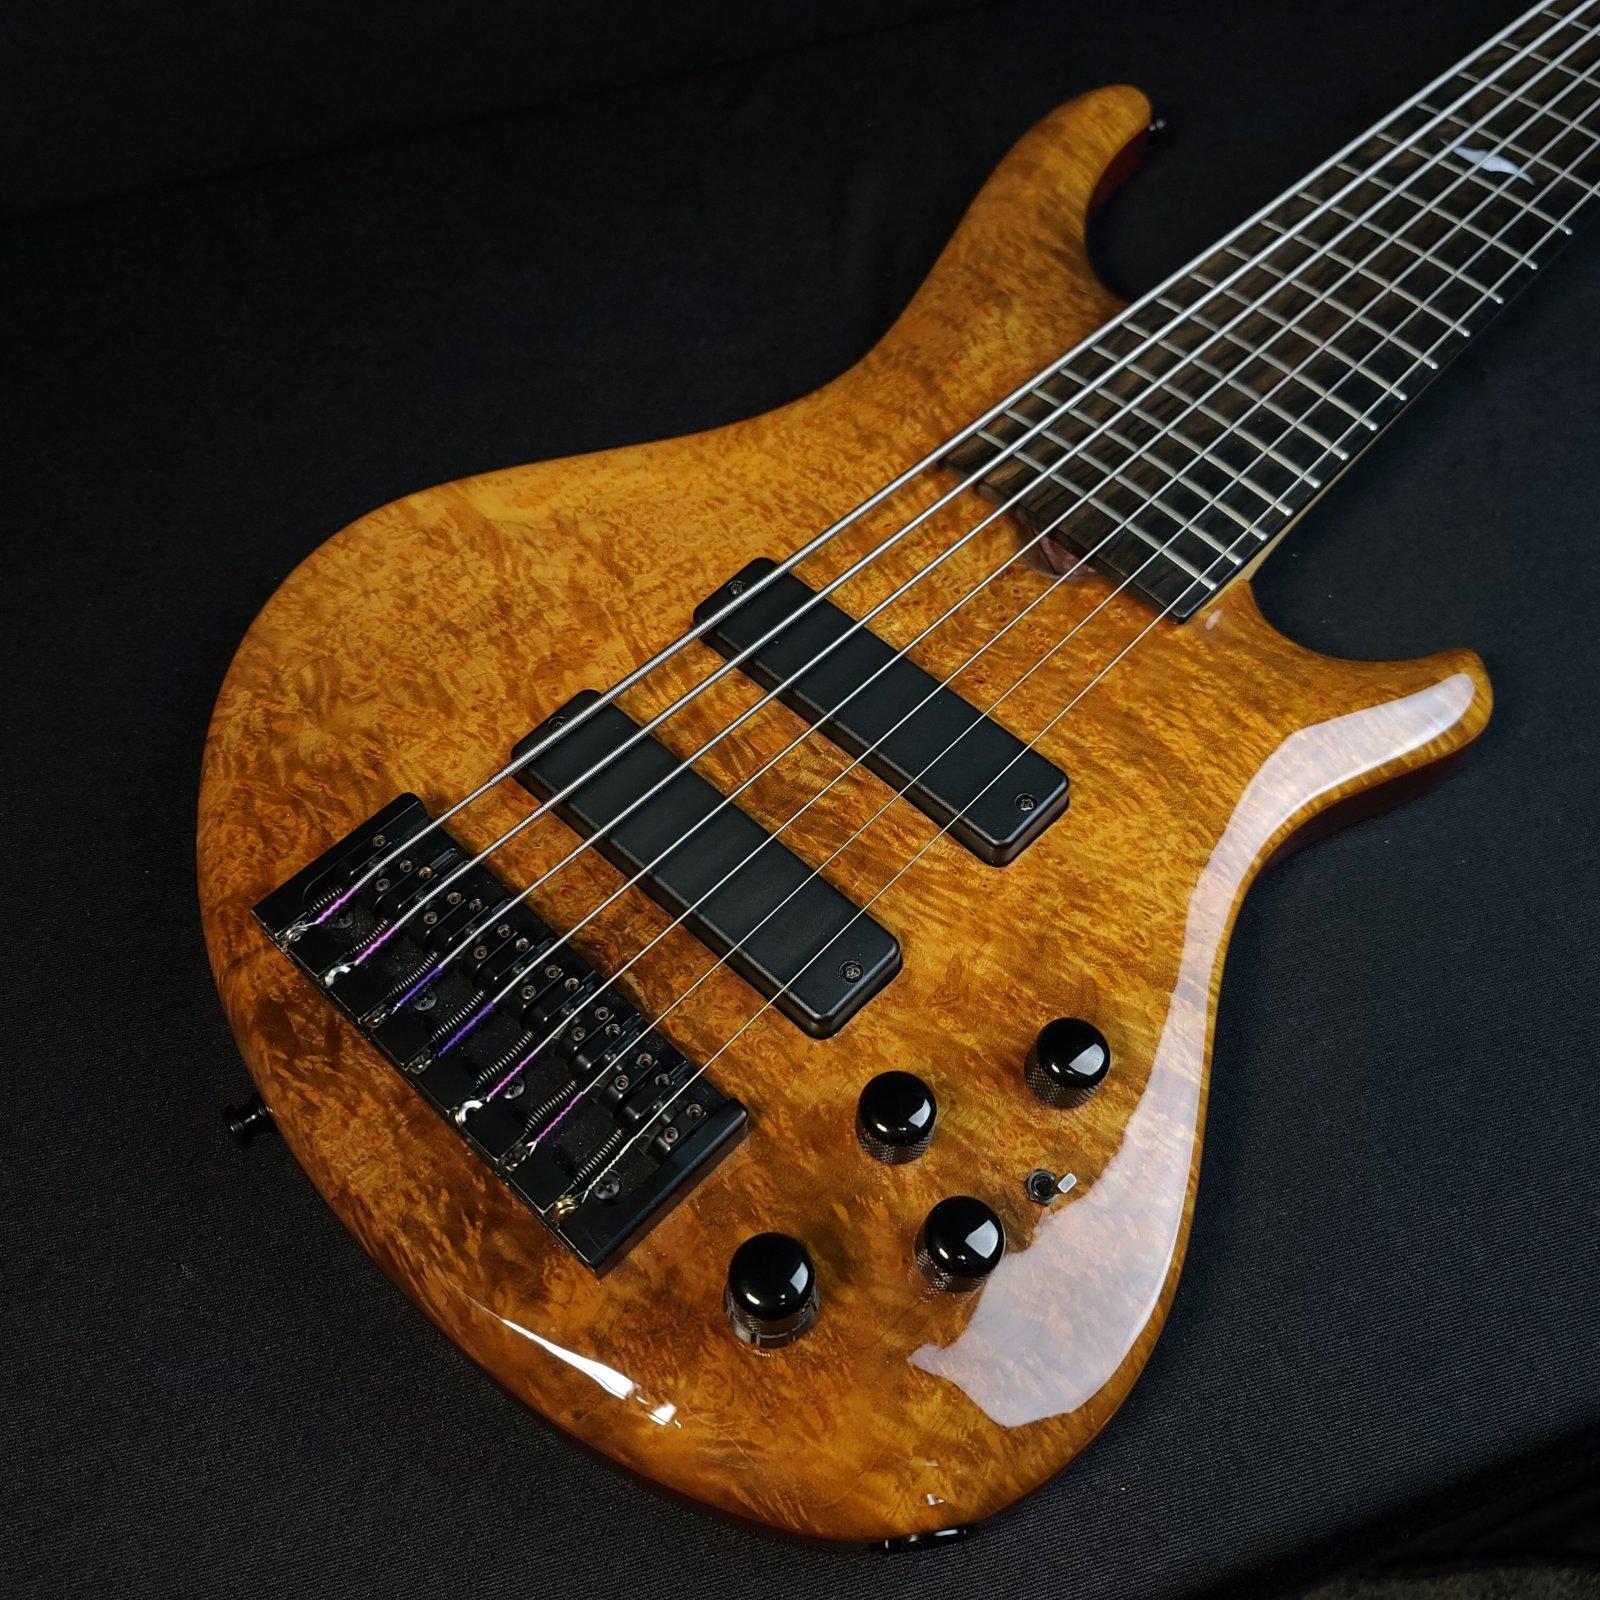 Used Roscoe SKB3007 SKB 3007 7 String Bass w/ Hard Case 35 Scale Length